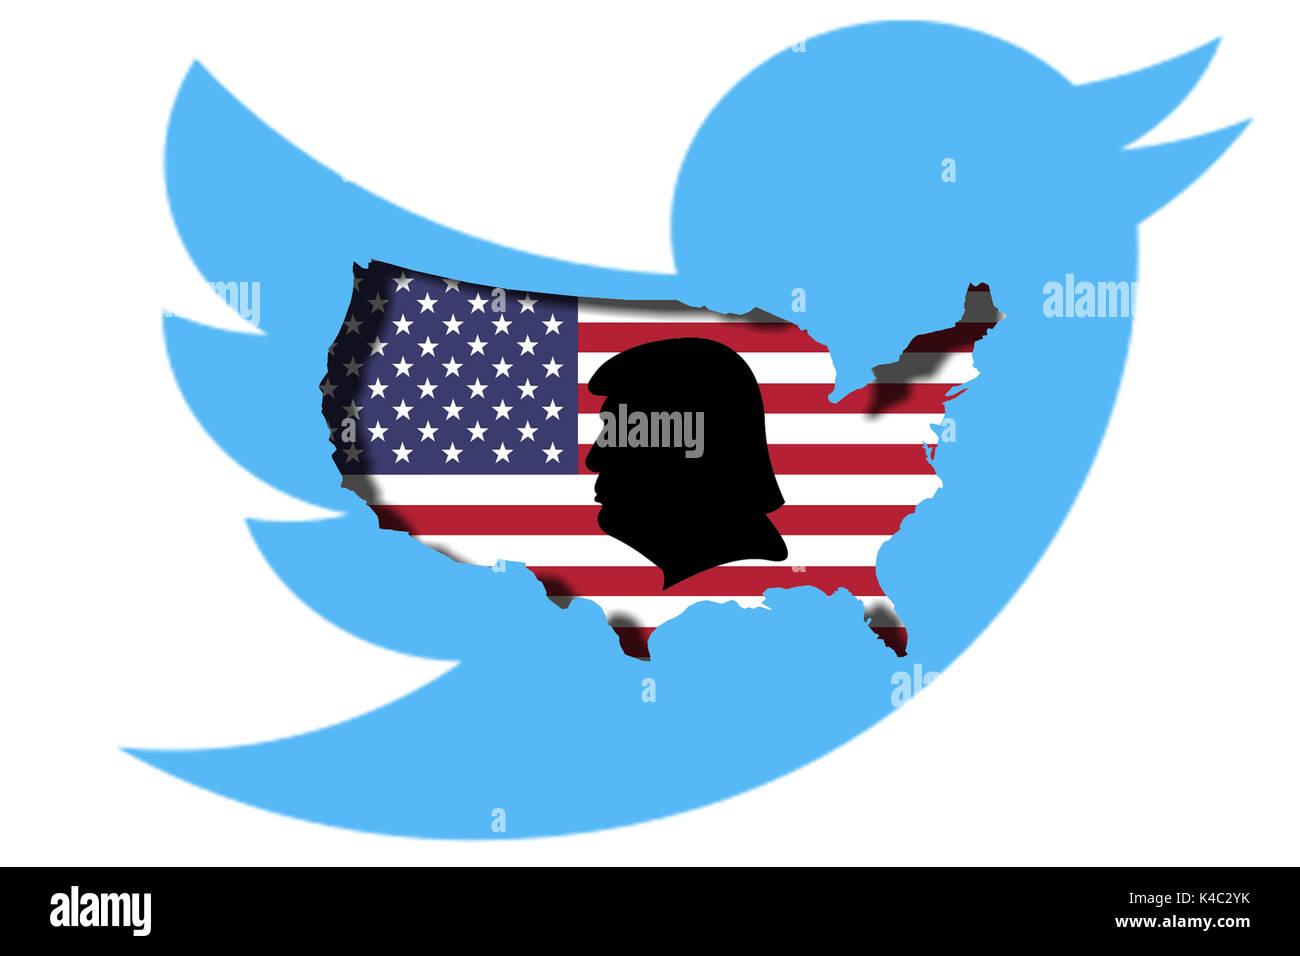 Twitter Presidency Of Donald Trump - Stock Image